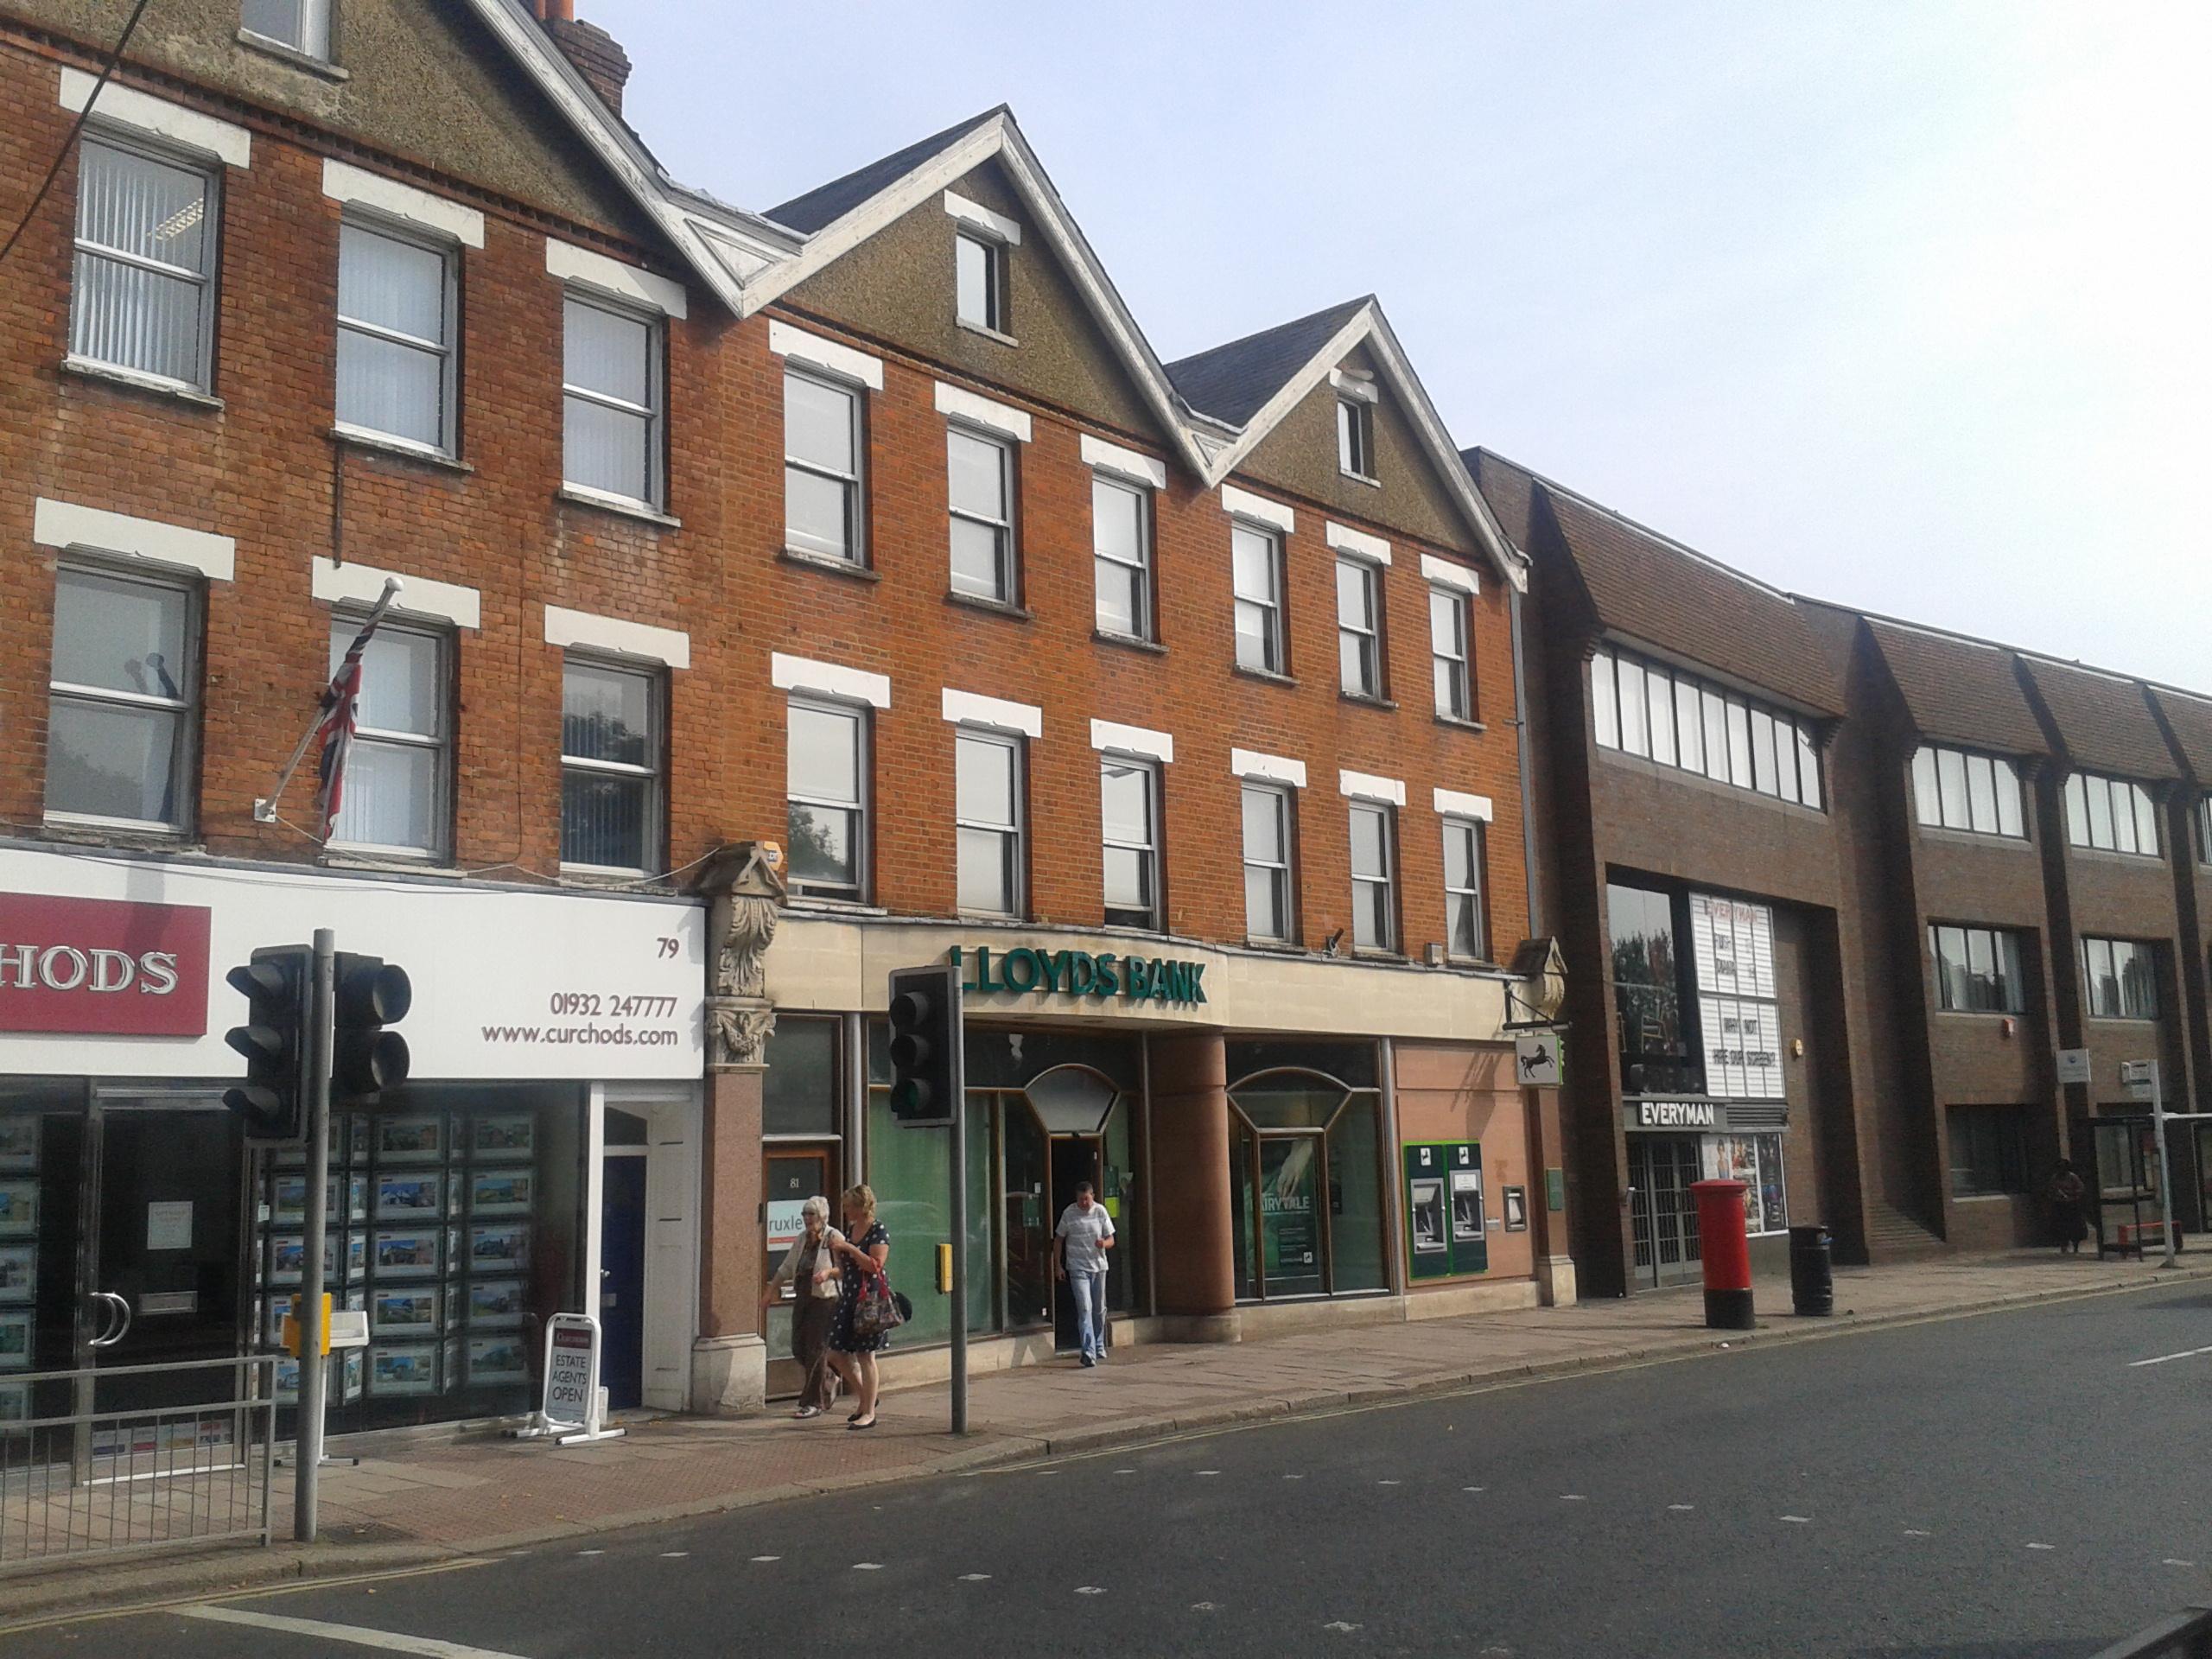 High Street, Walton‐on‐Thames